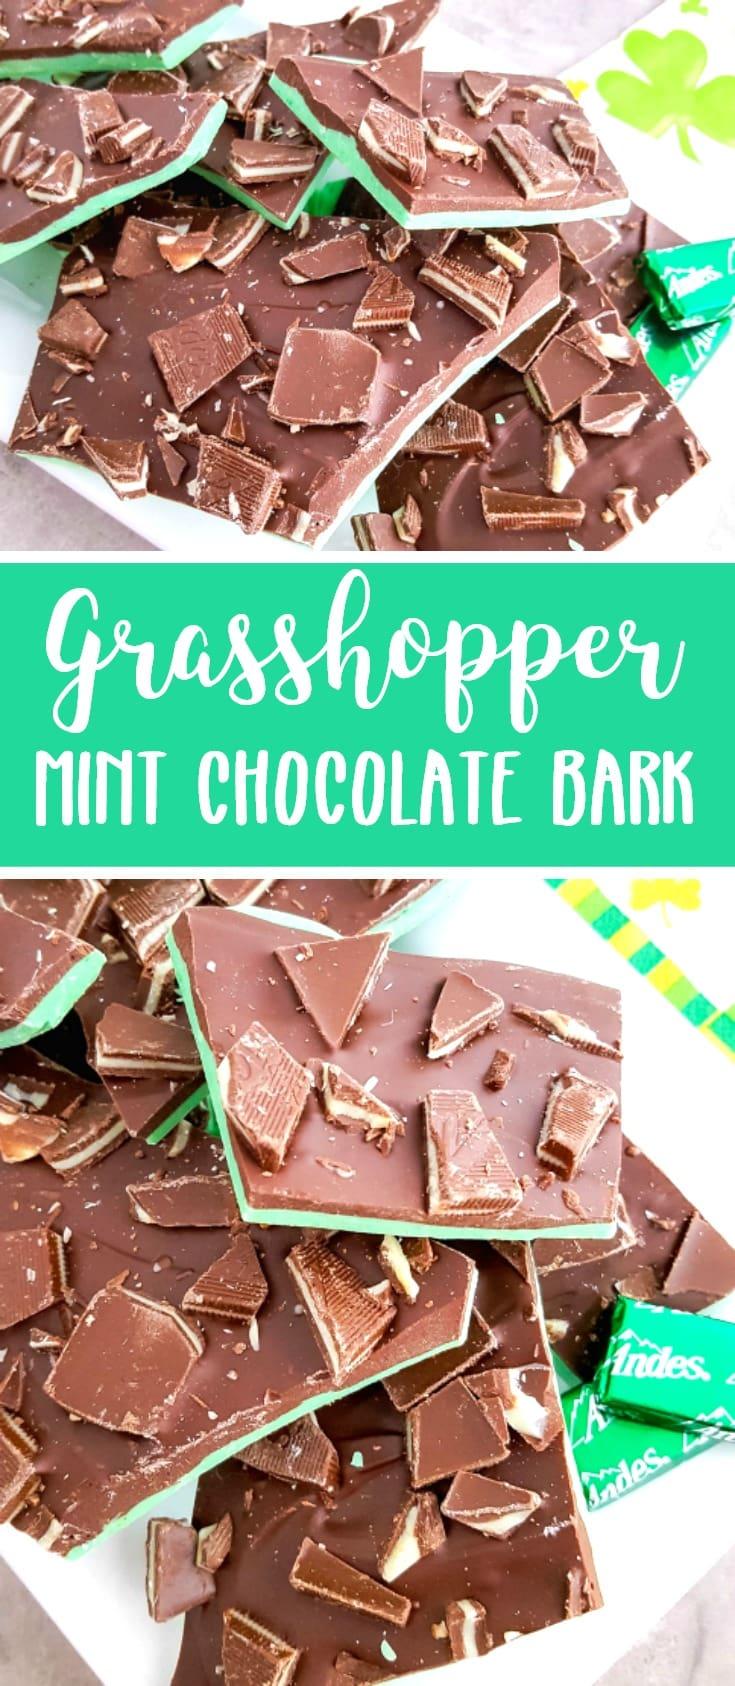 grasshopper mint chocolate bark recipe